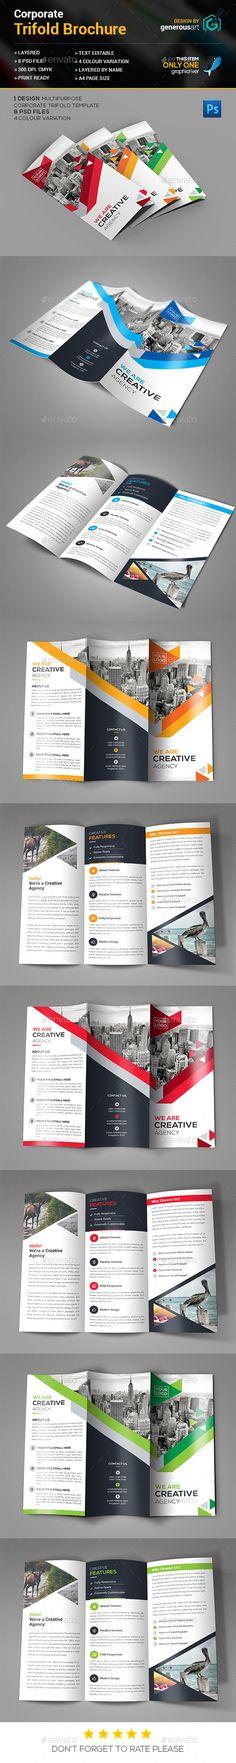 Trifold Brochure Template PSD #design Download: http://graphicriver.net/item/trifold-brochure/13309986?ref=ksioks